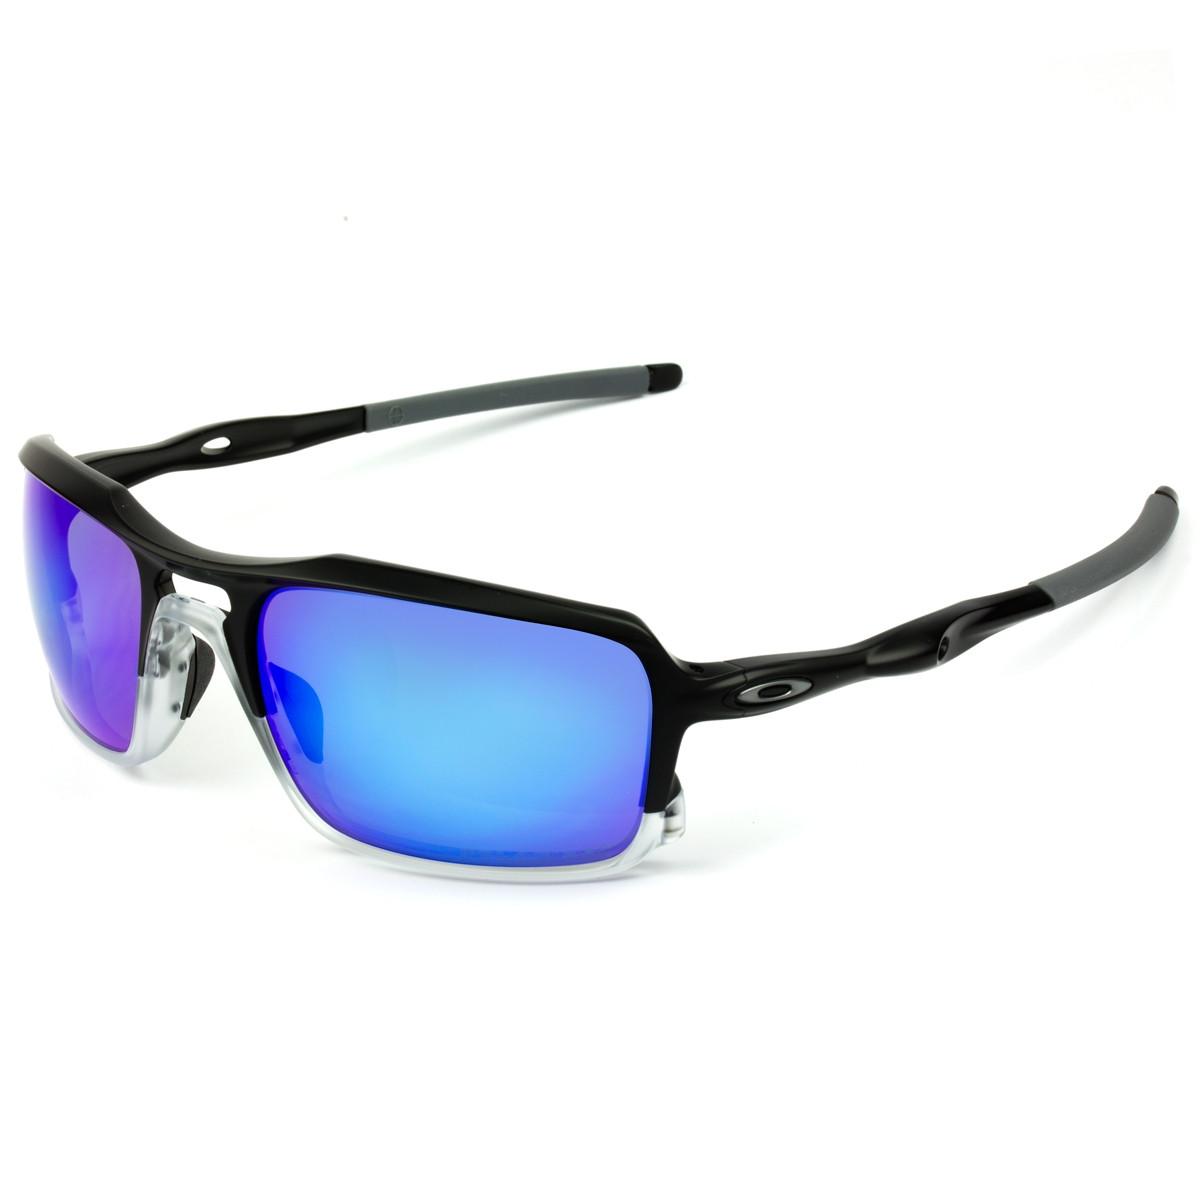 Óculos Oakley Triggerman Matte Black Lente Sapphire Iridium Polarizado fe8b598911